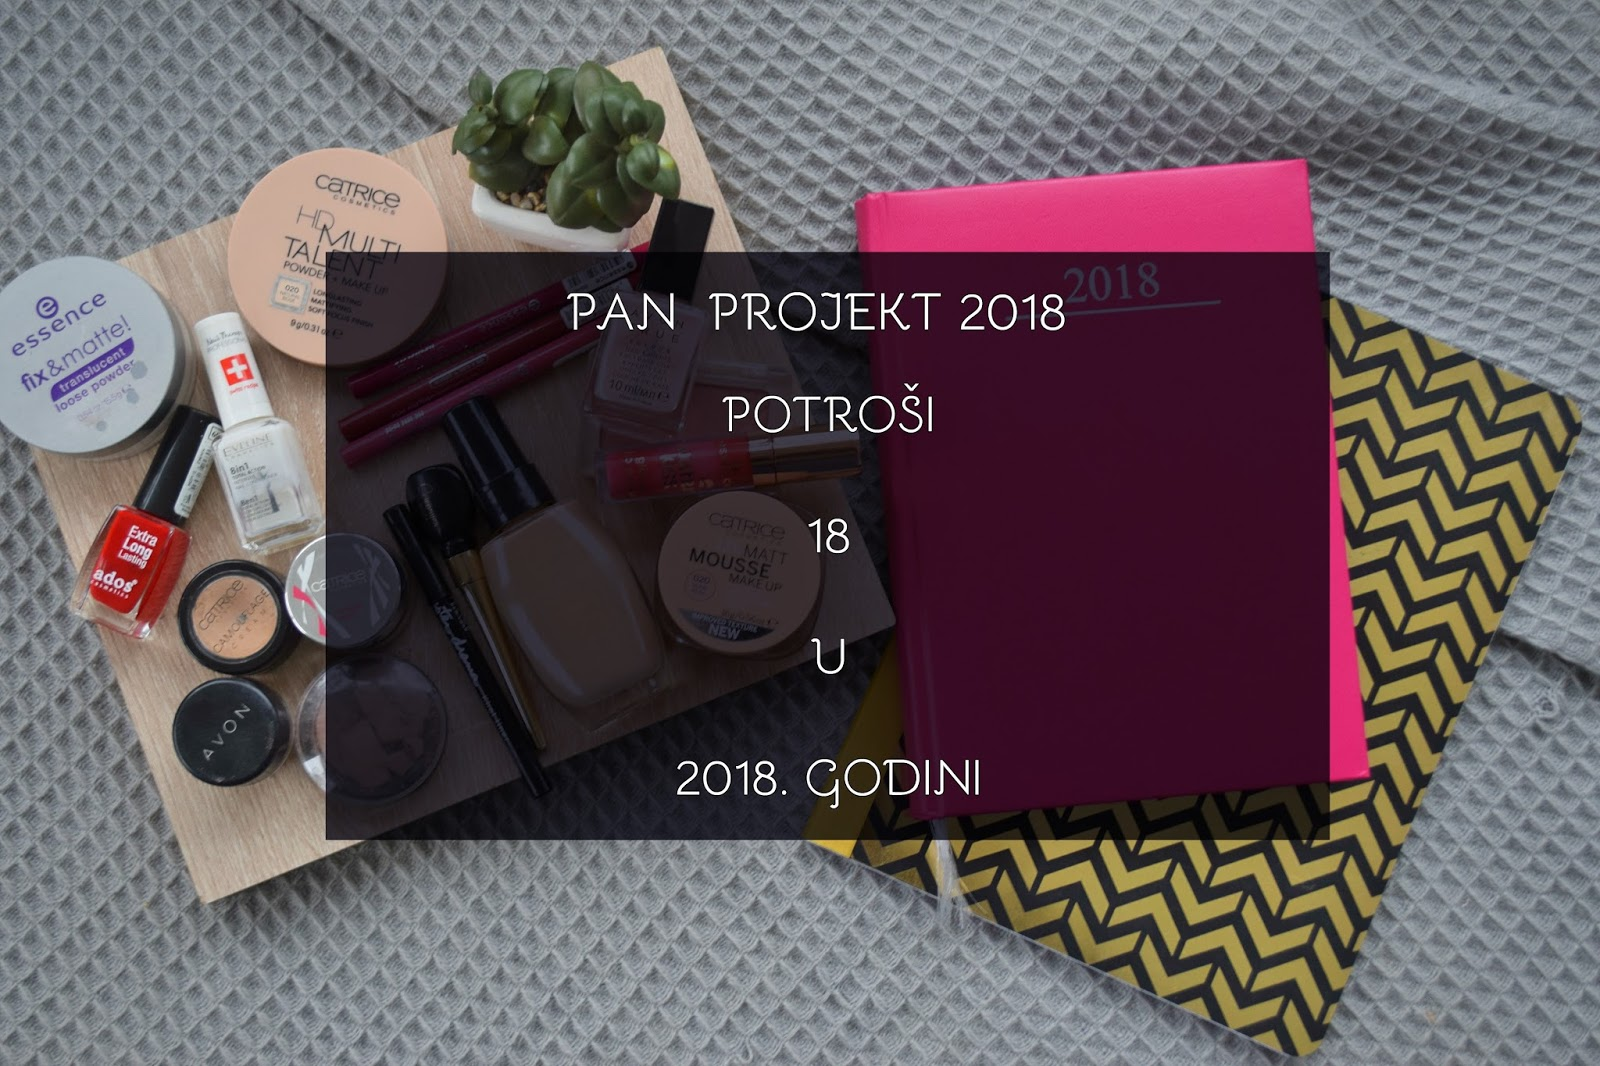 Pan-projekt-2018-potroši-18-u-2018-godini